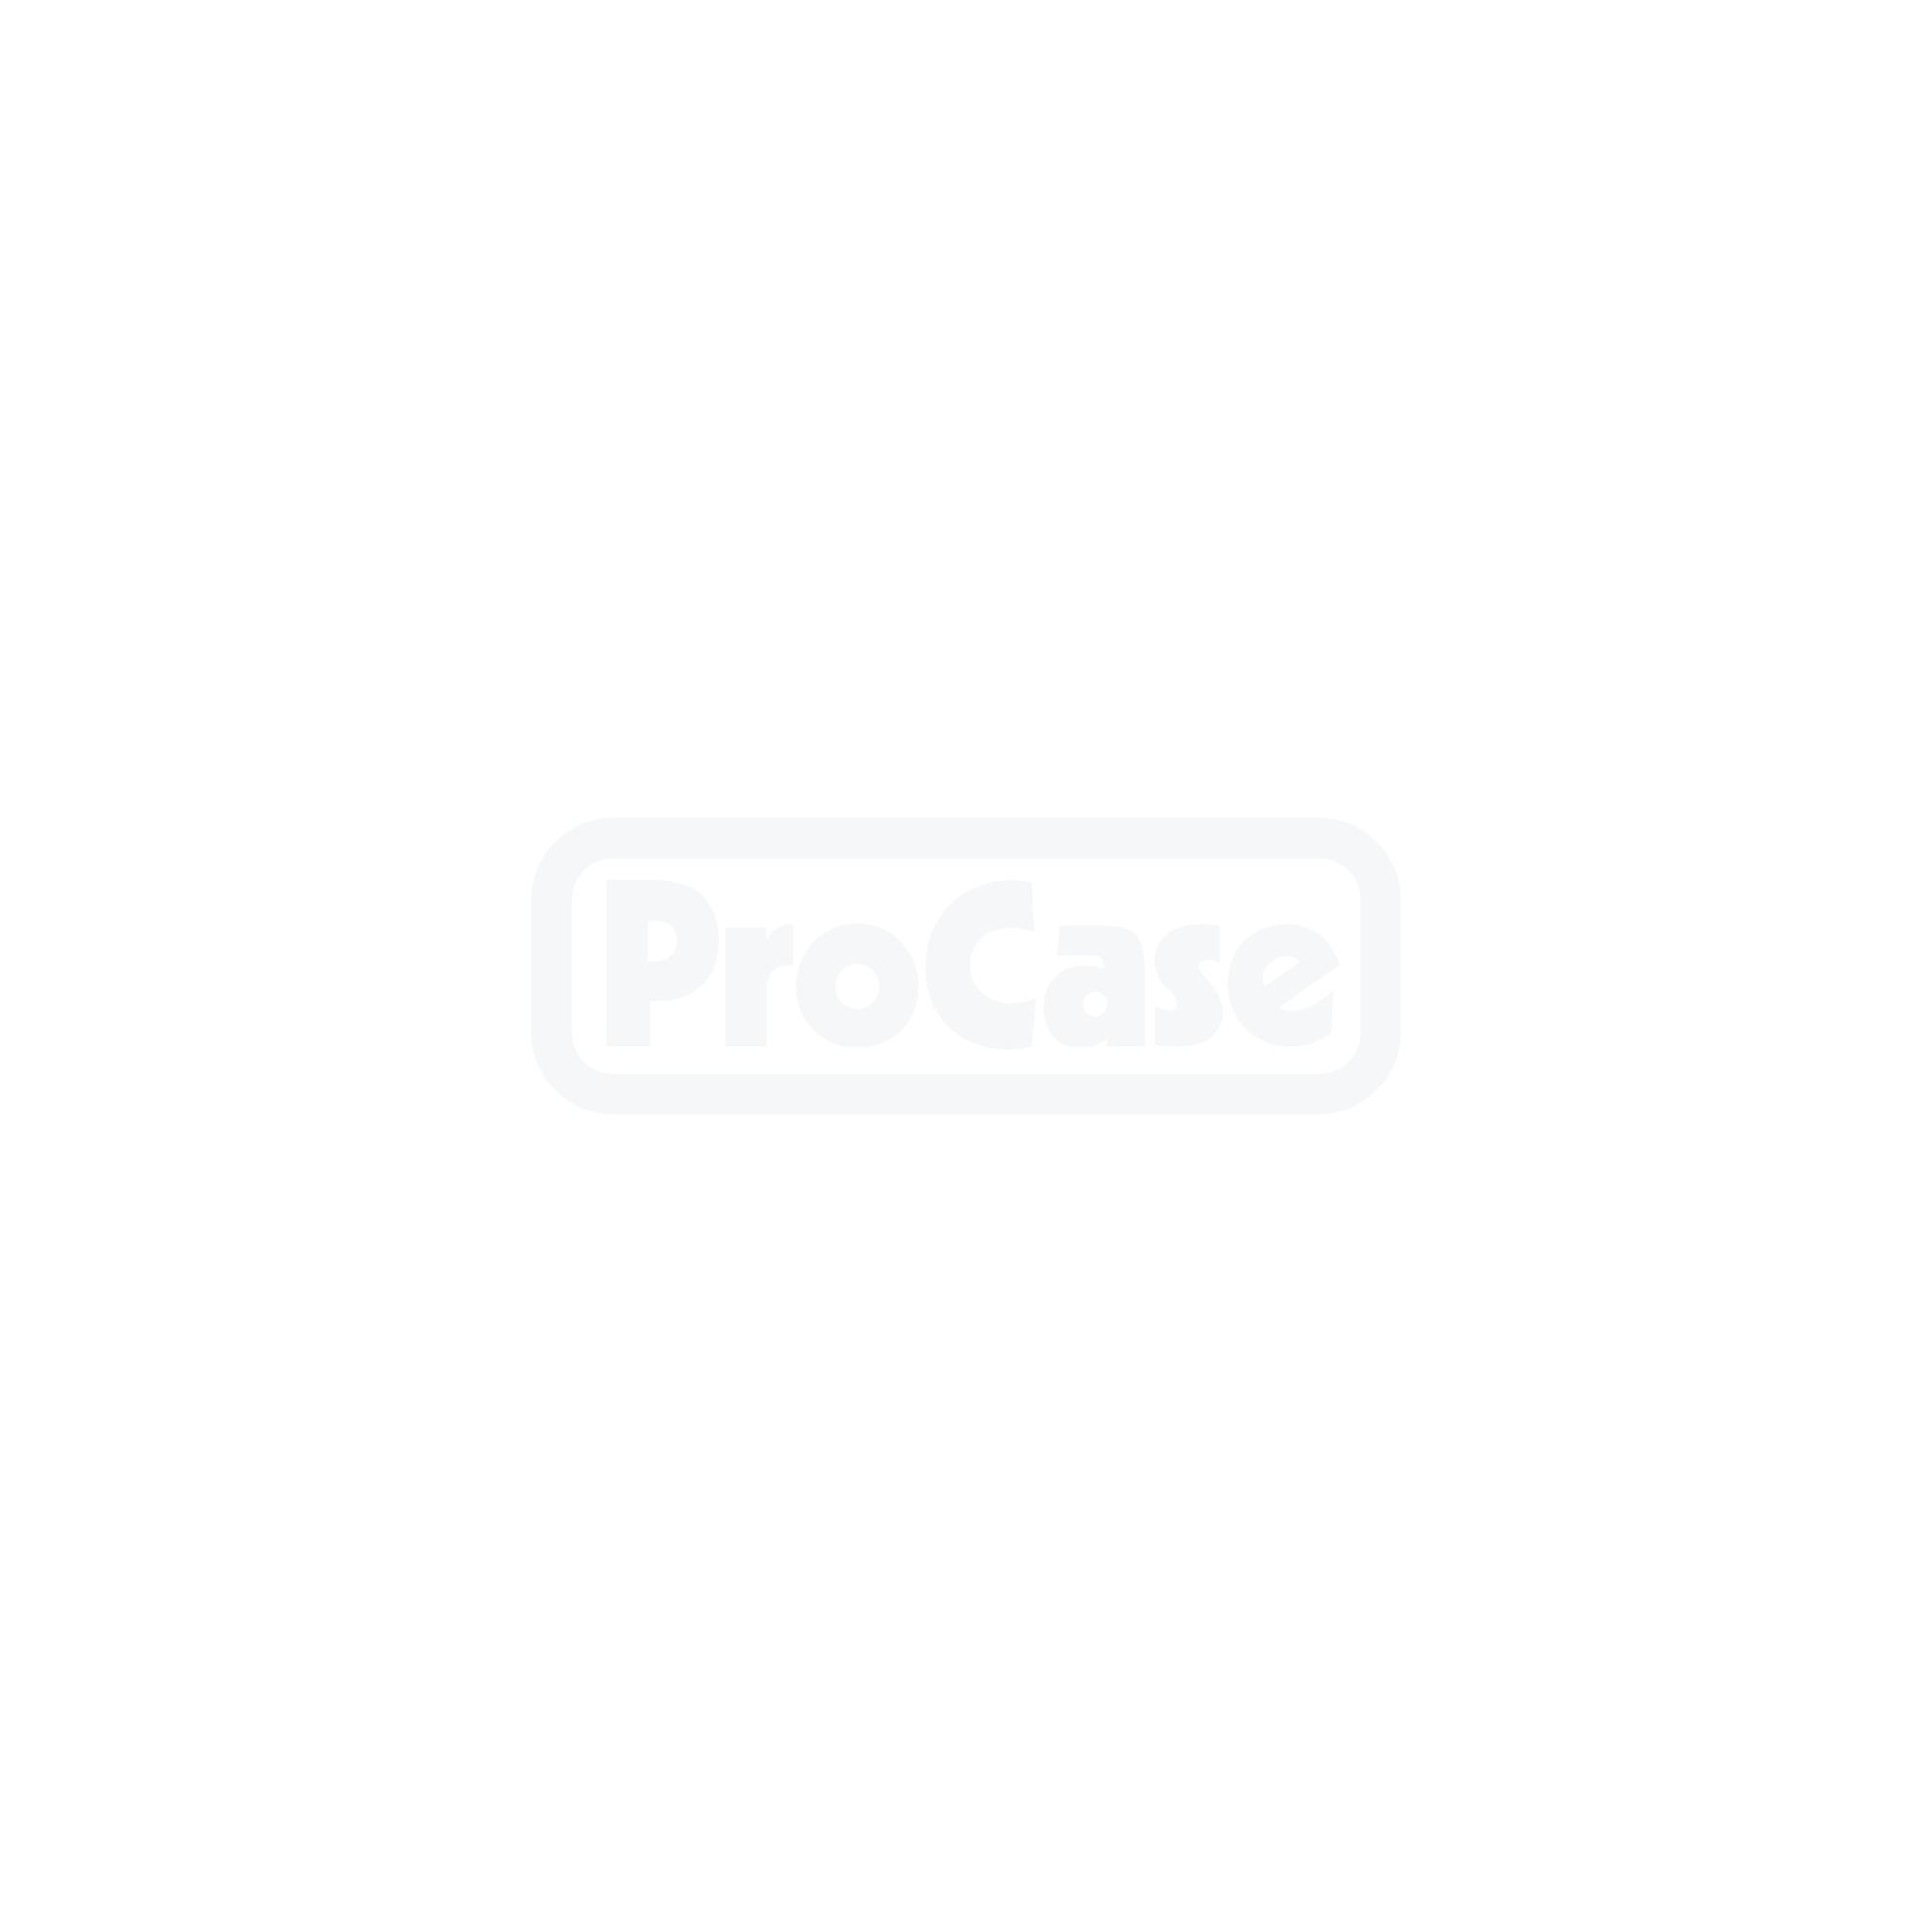 Flightcase für 2 d&b audiotechnik Z5390 Y Flugrahmen